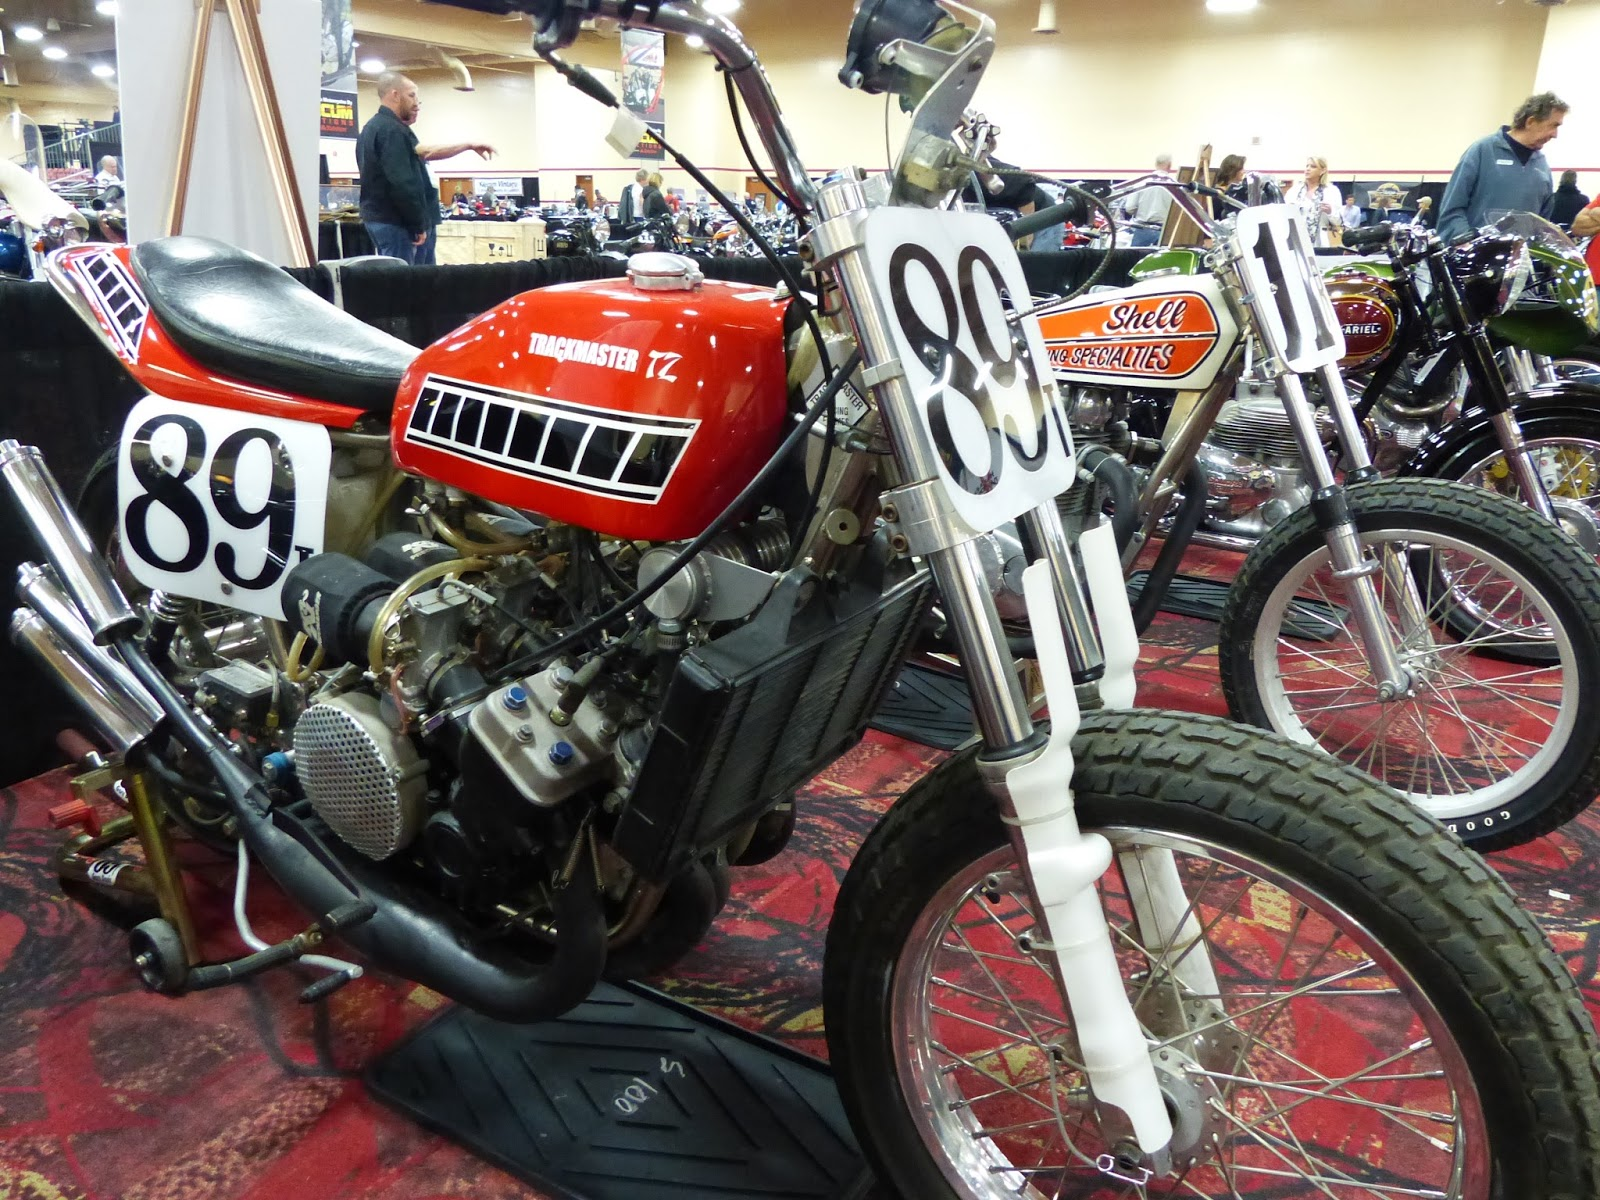 1975 yamaha tz750 flat tracker for sale at the 2016 mecum las vegas motorcycle auction